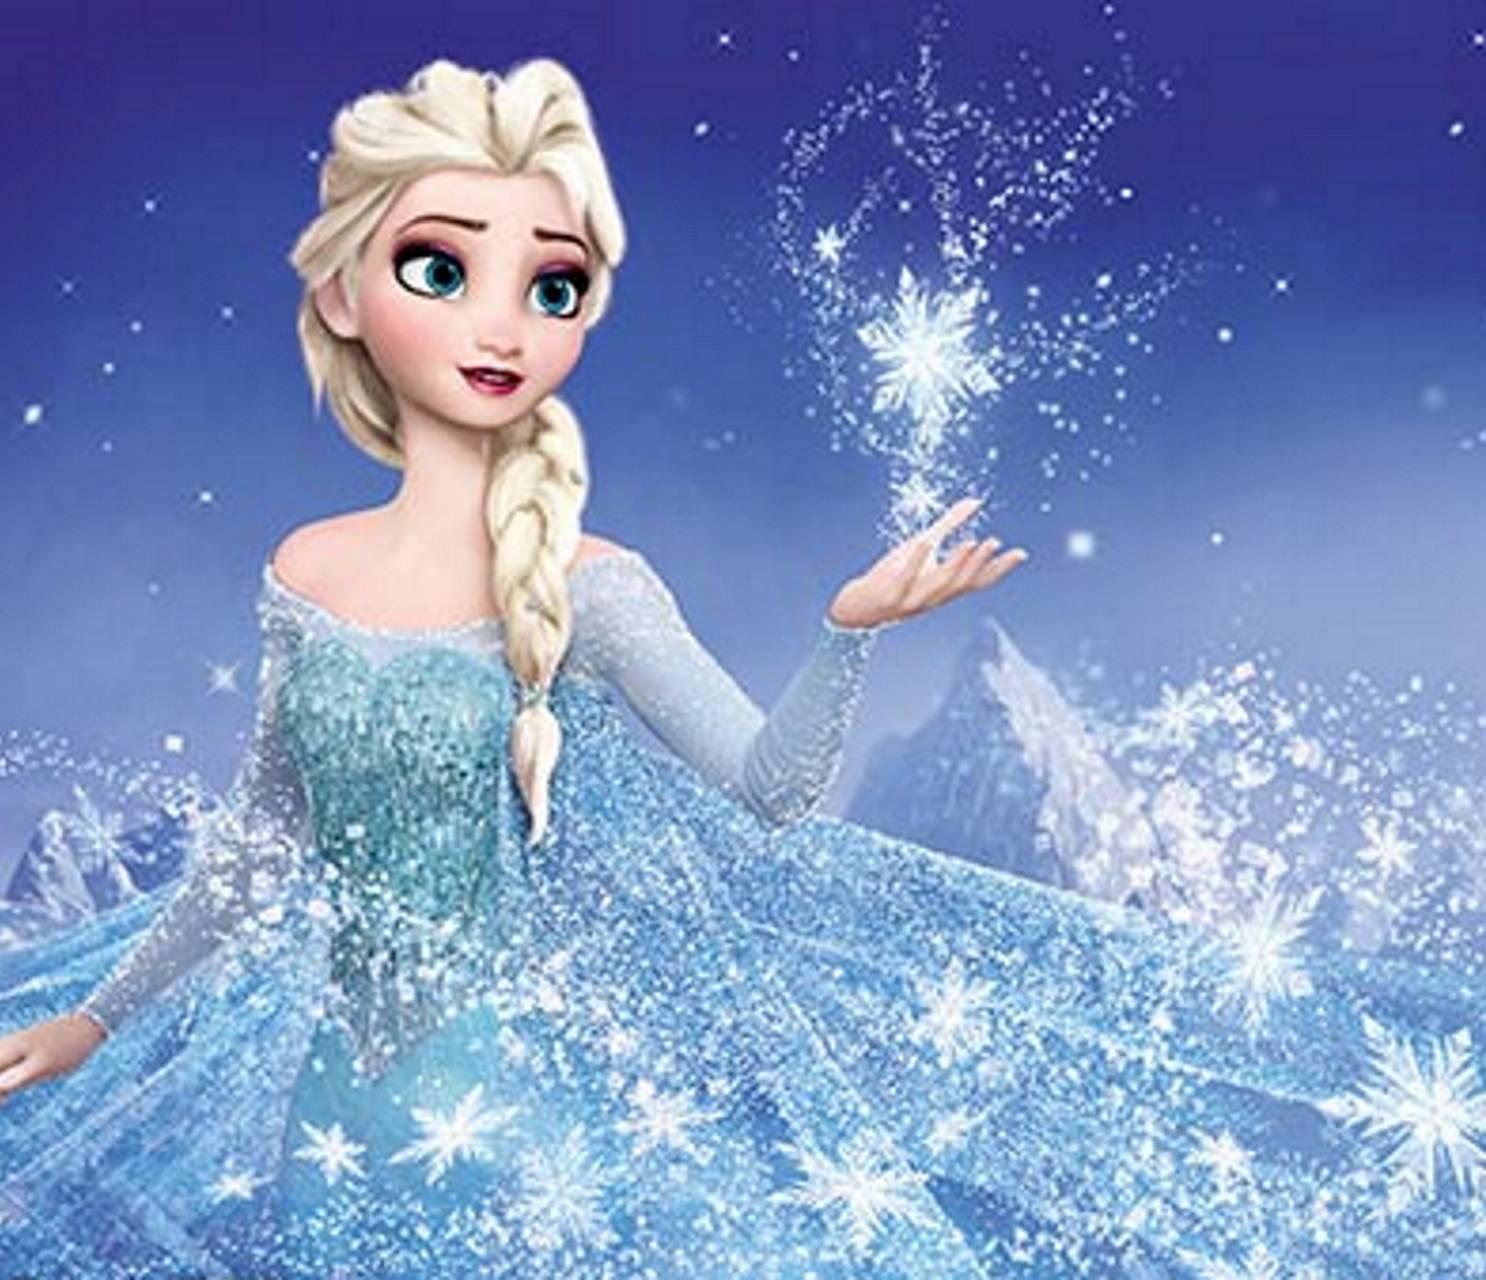 The Snow Queen Elsa